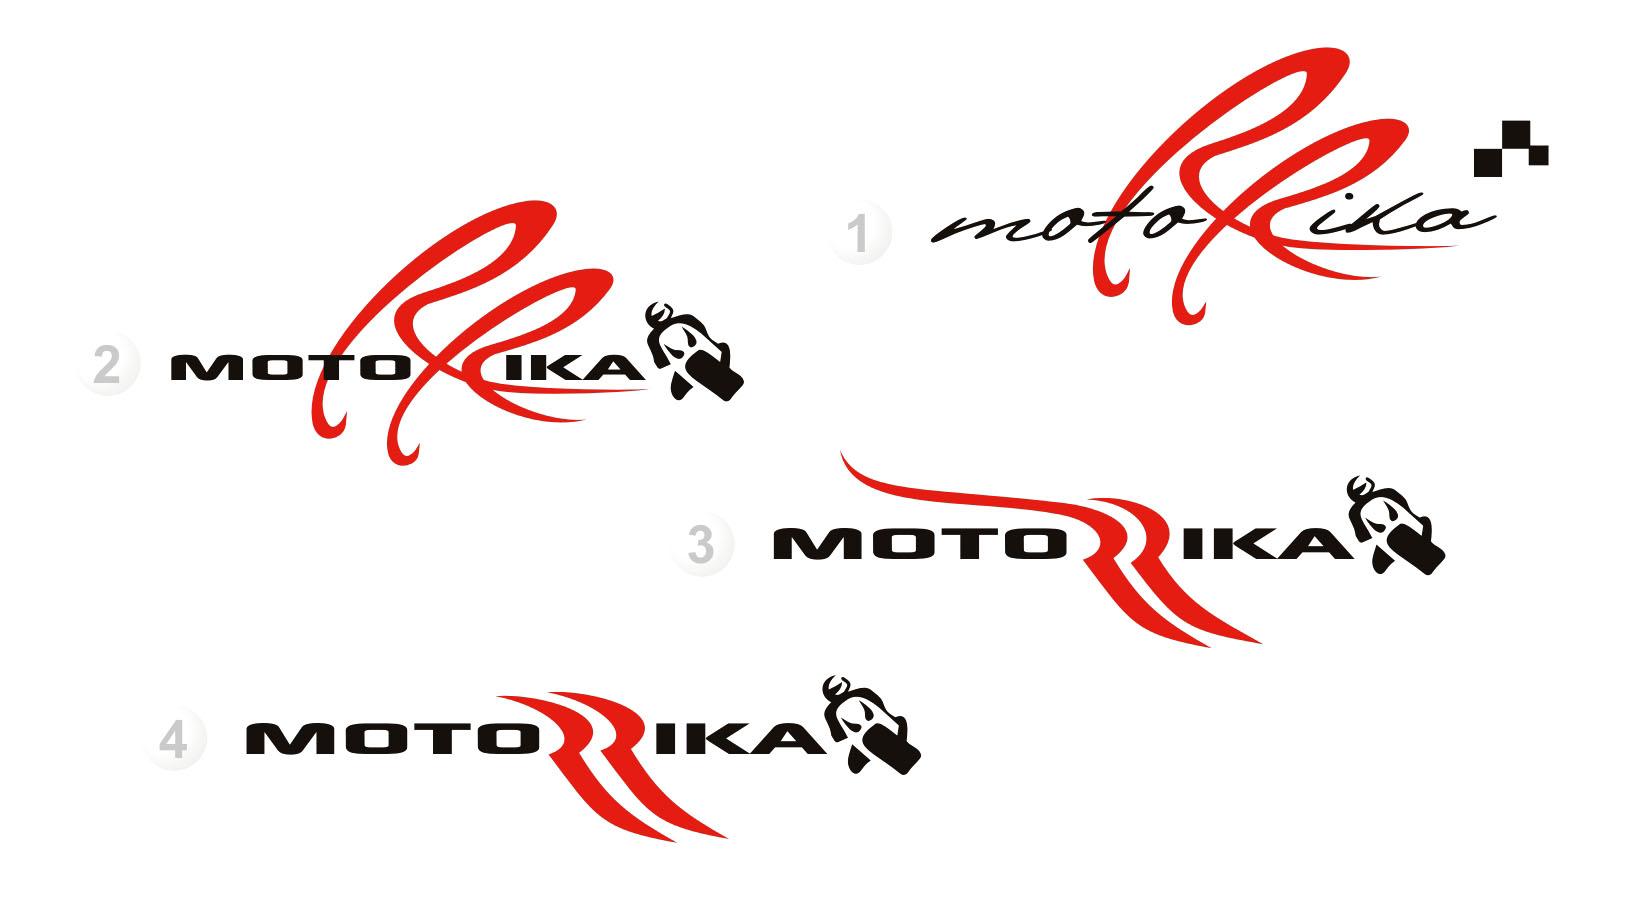 Мотогонки. Логотип, фирменный стиль. фото f_4dc3f01266a3b.jpg